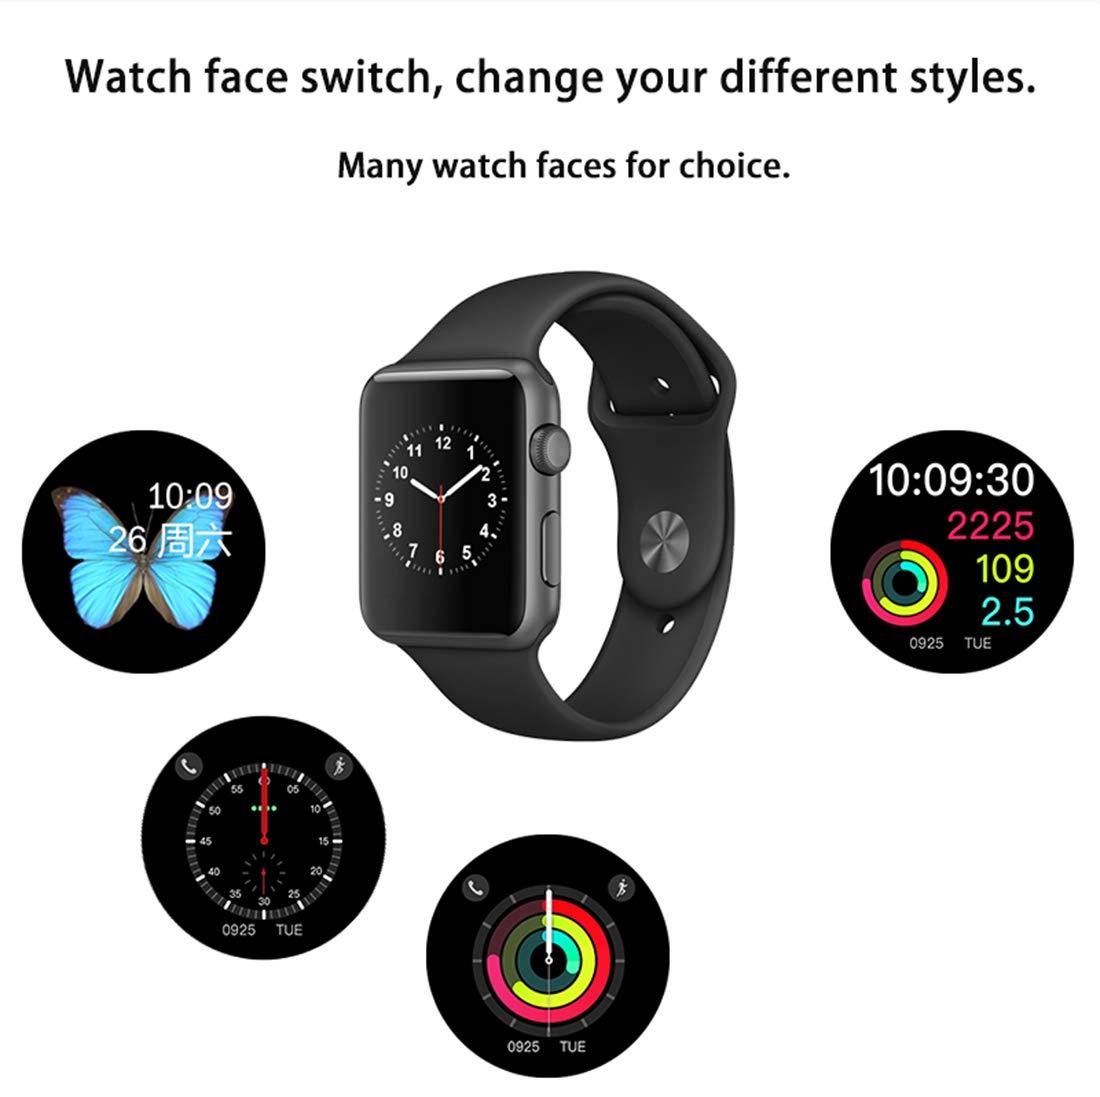 Smart watch W53 Bluetooth Series 3 Smartwatch Estuche para Apple iOS iPhone Android Phone Deporte Pulsera Fitness Reloj De Pulsera,Aluminumsilver